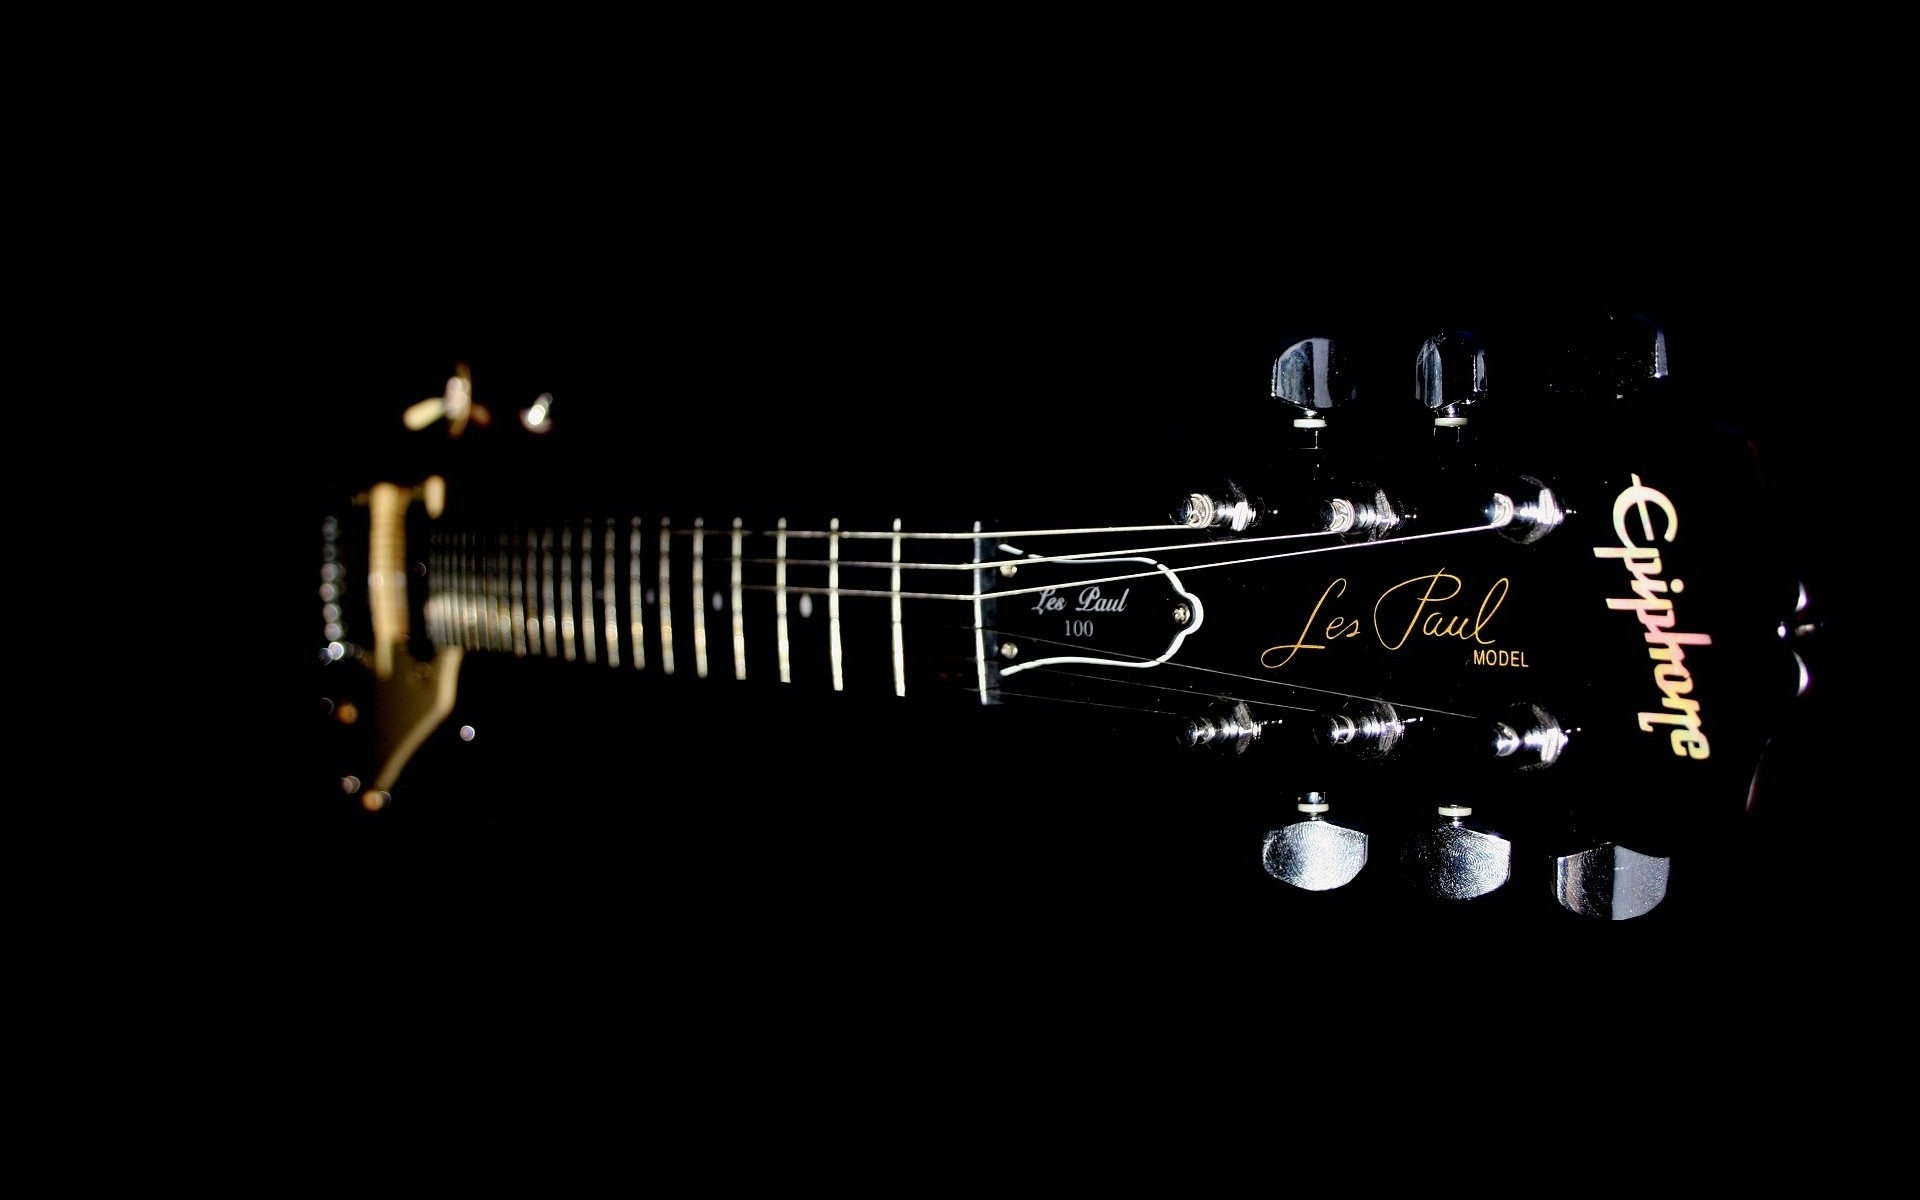 guitar guitar wallpaper 27923836 fanpop